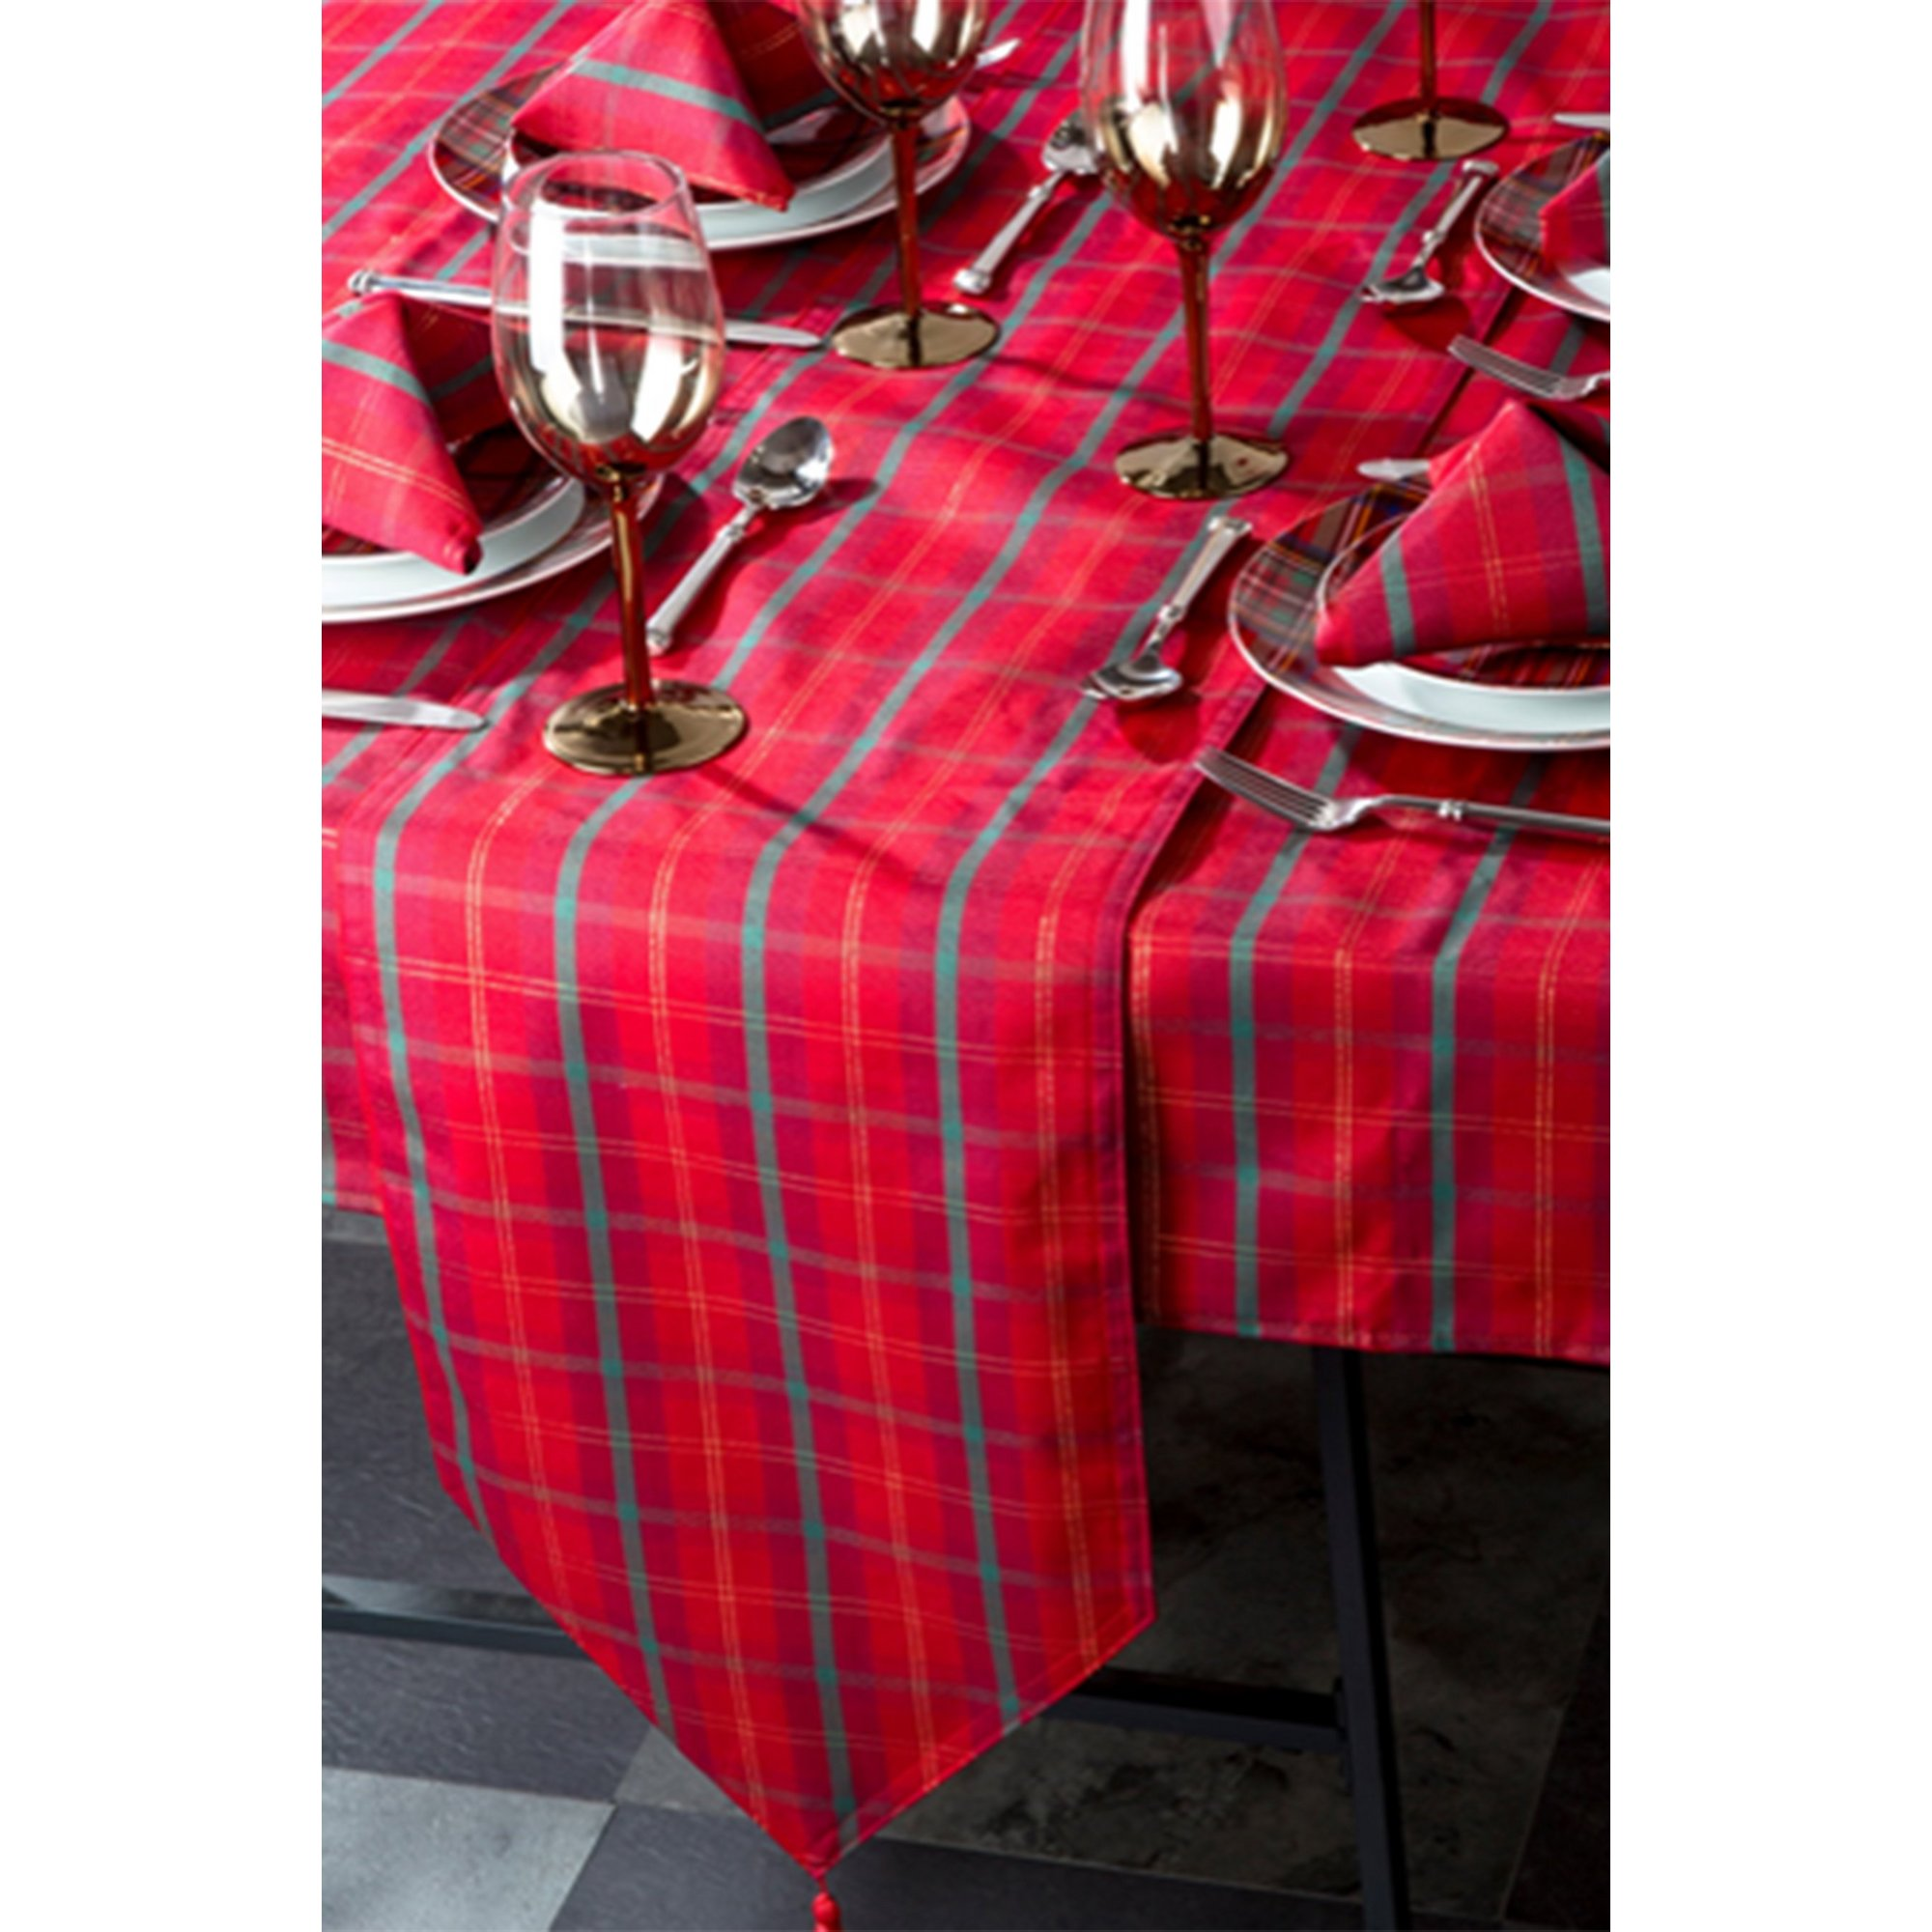 Image of 10 Piece Tartan Jacquard Table Linen Set